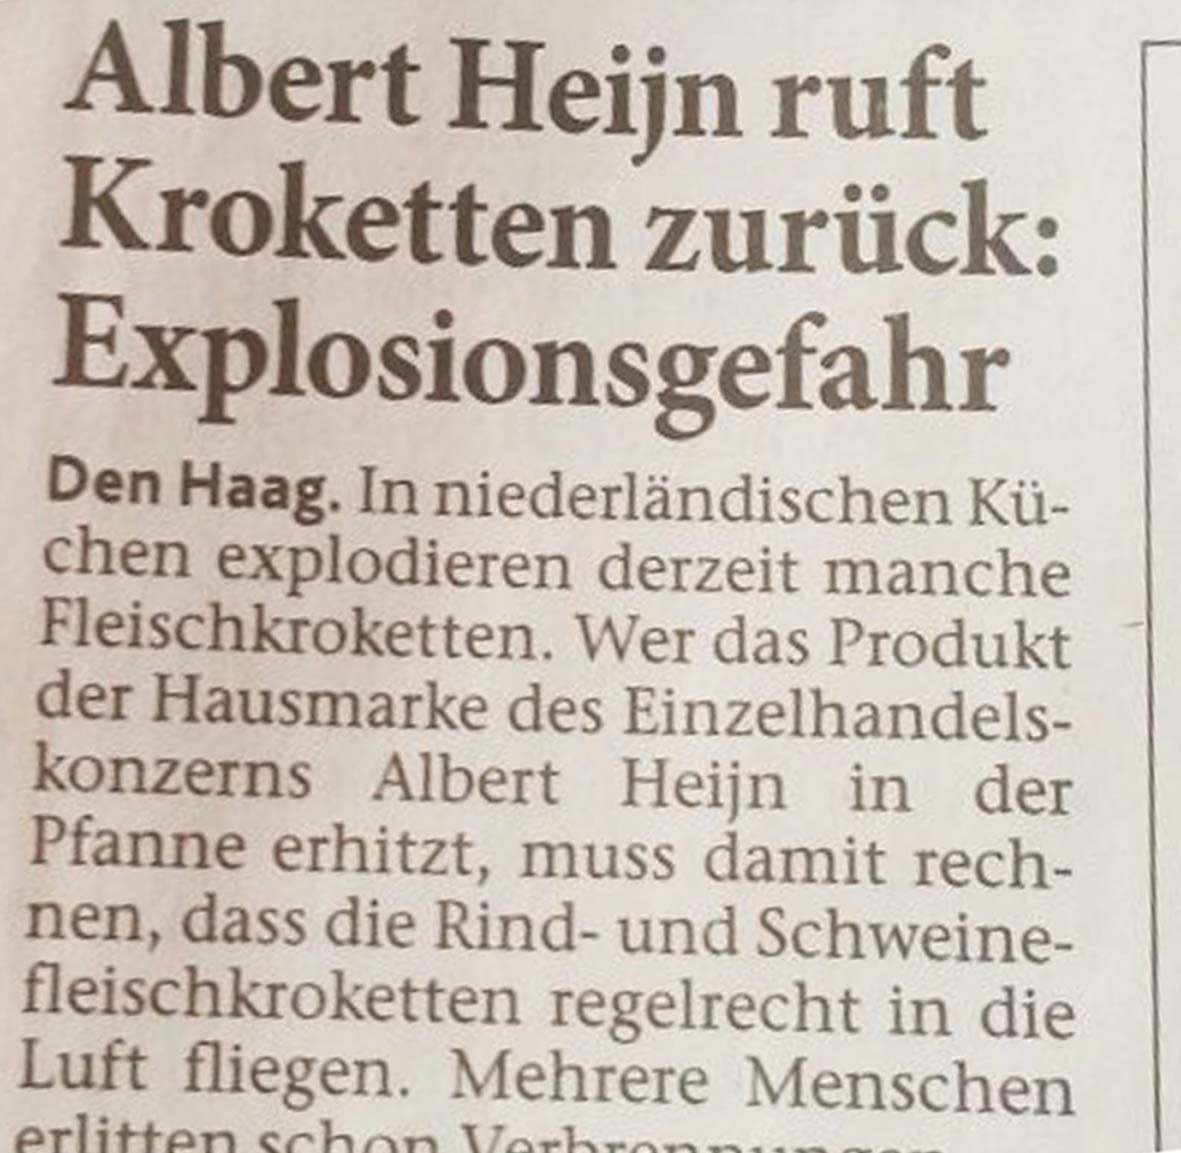 "Albert Heijn ruft Kroketten zurück: ""Explosionsgefahr""."